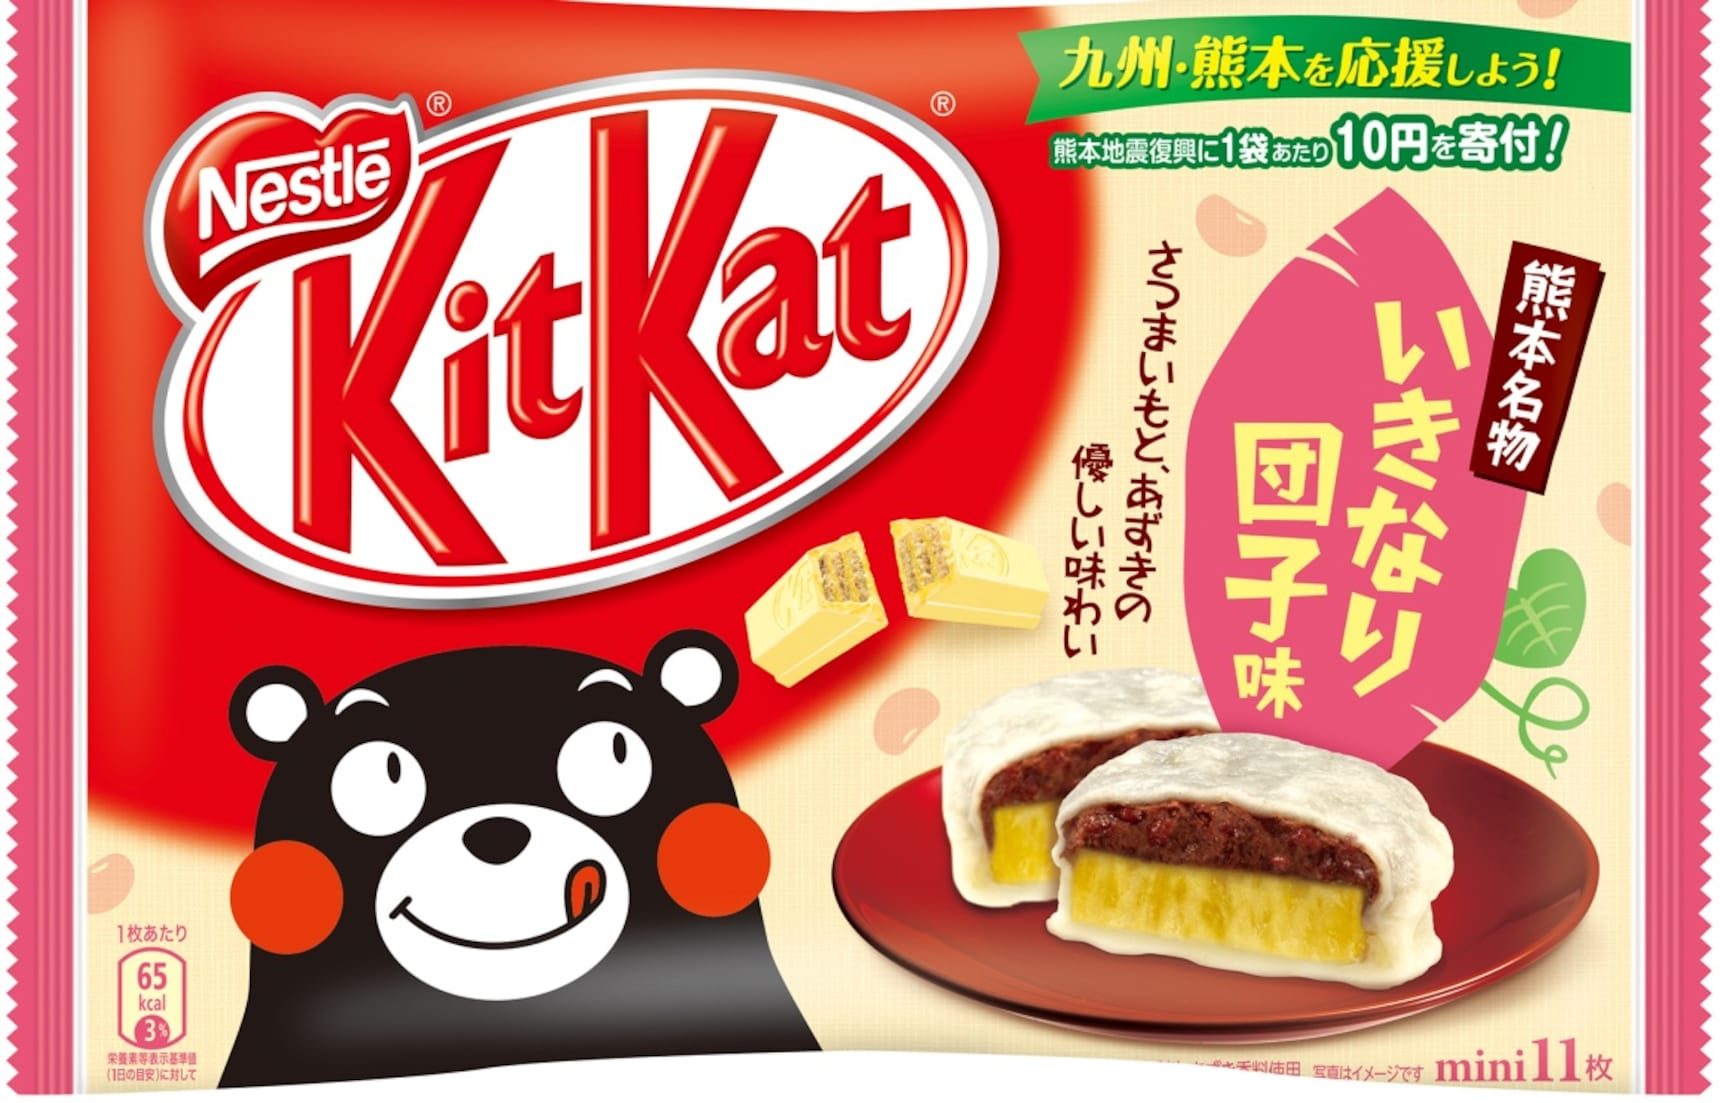 Support Kumamoto by Purchasing a Kit Kat